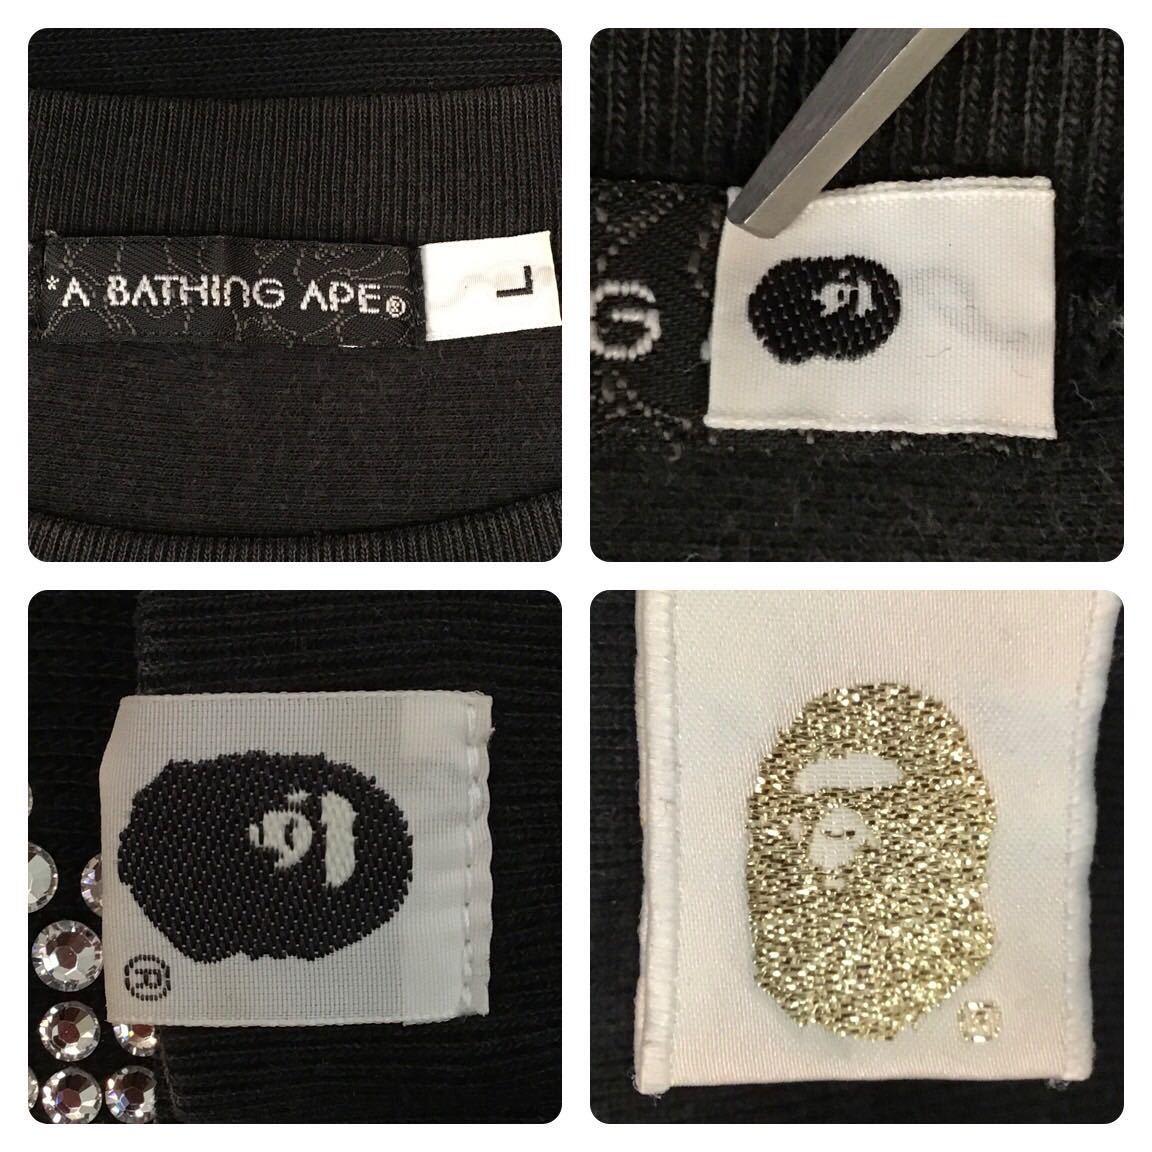 ★kanye着用モデル★ スワロフスキー ASNKA logo スウェット Lサイズ a bathing ape bape swarovski ラインストーン エイプ ベイプ nigo